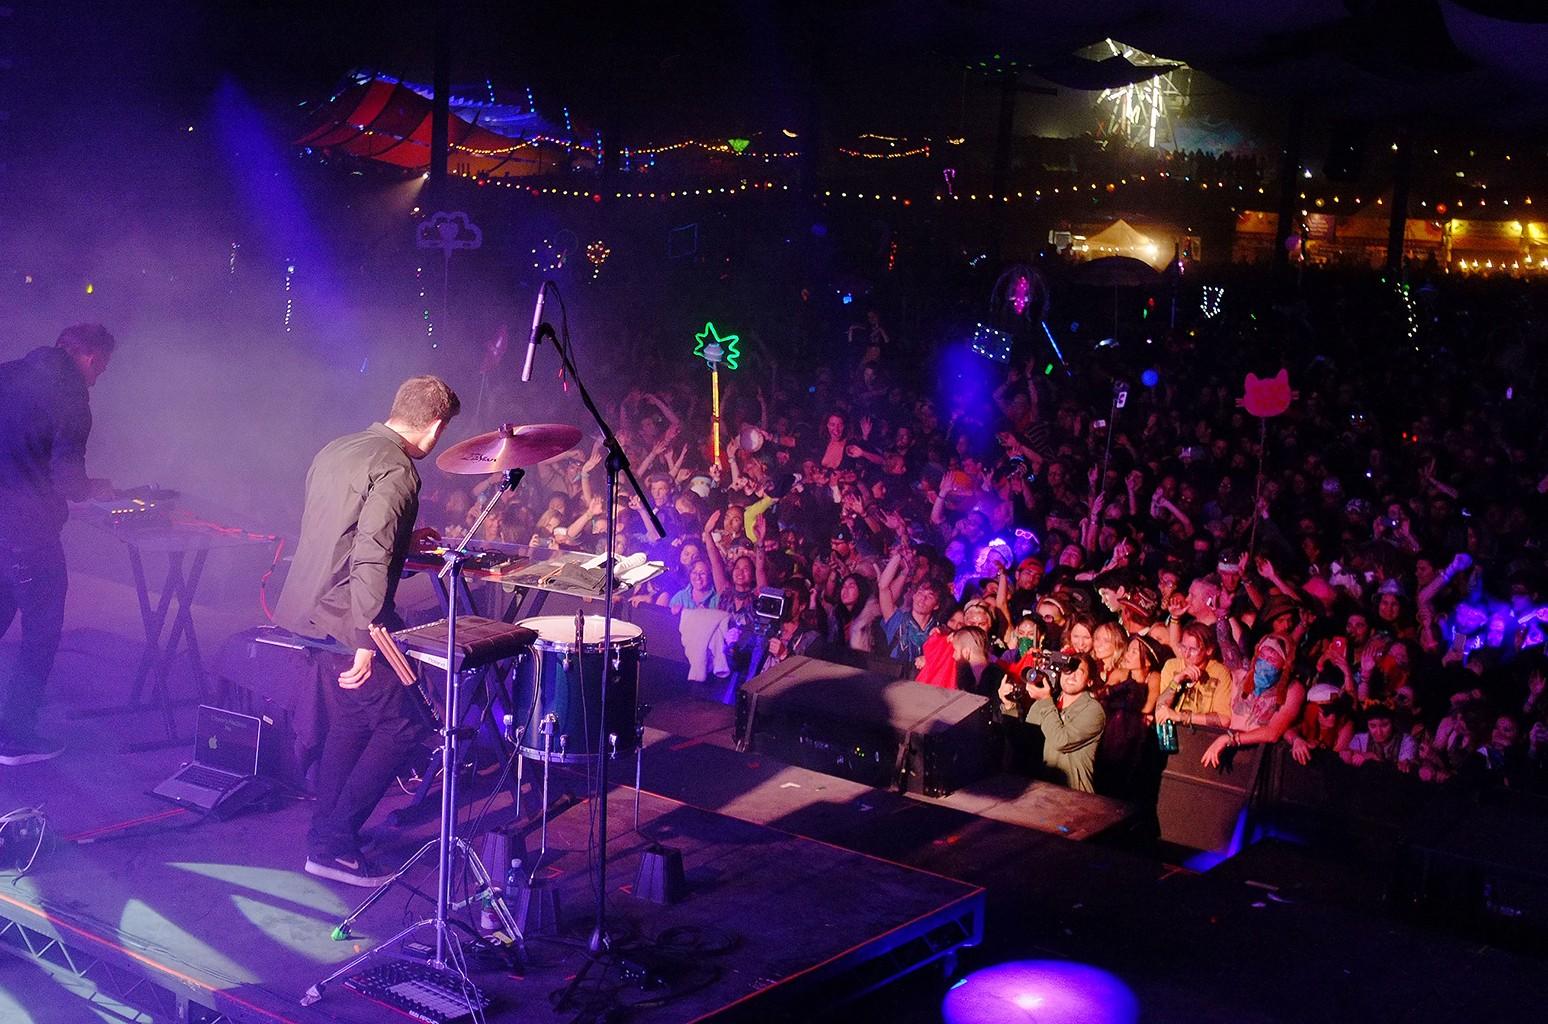 Lightning In A Bottle Festival 2015 in San Miguel, Calif.